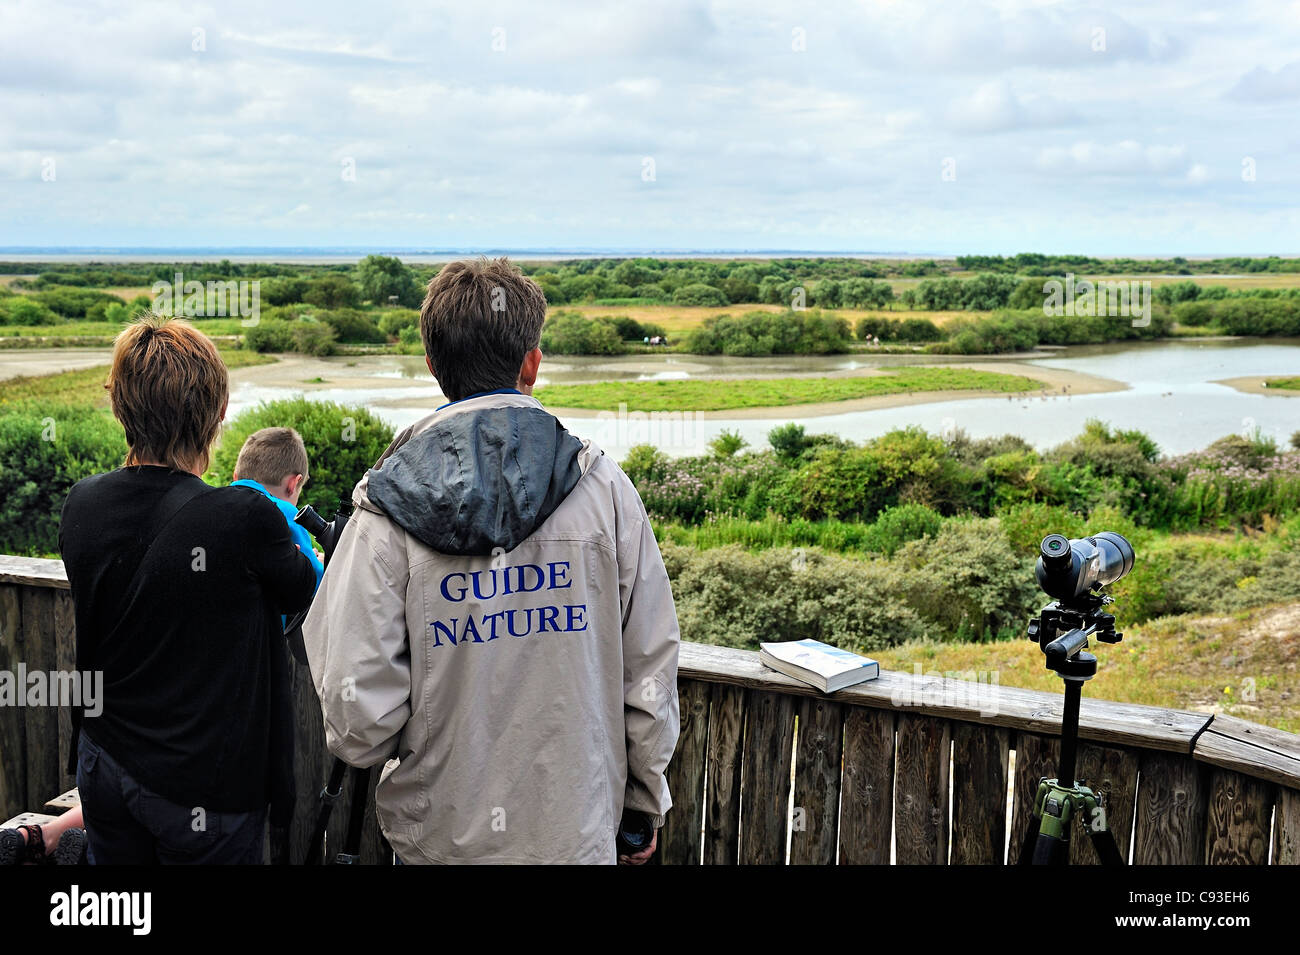 Ornithologische Parc Marquenterre, Picardie, Frankreich. Stockbild